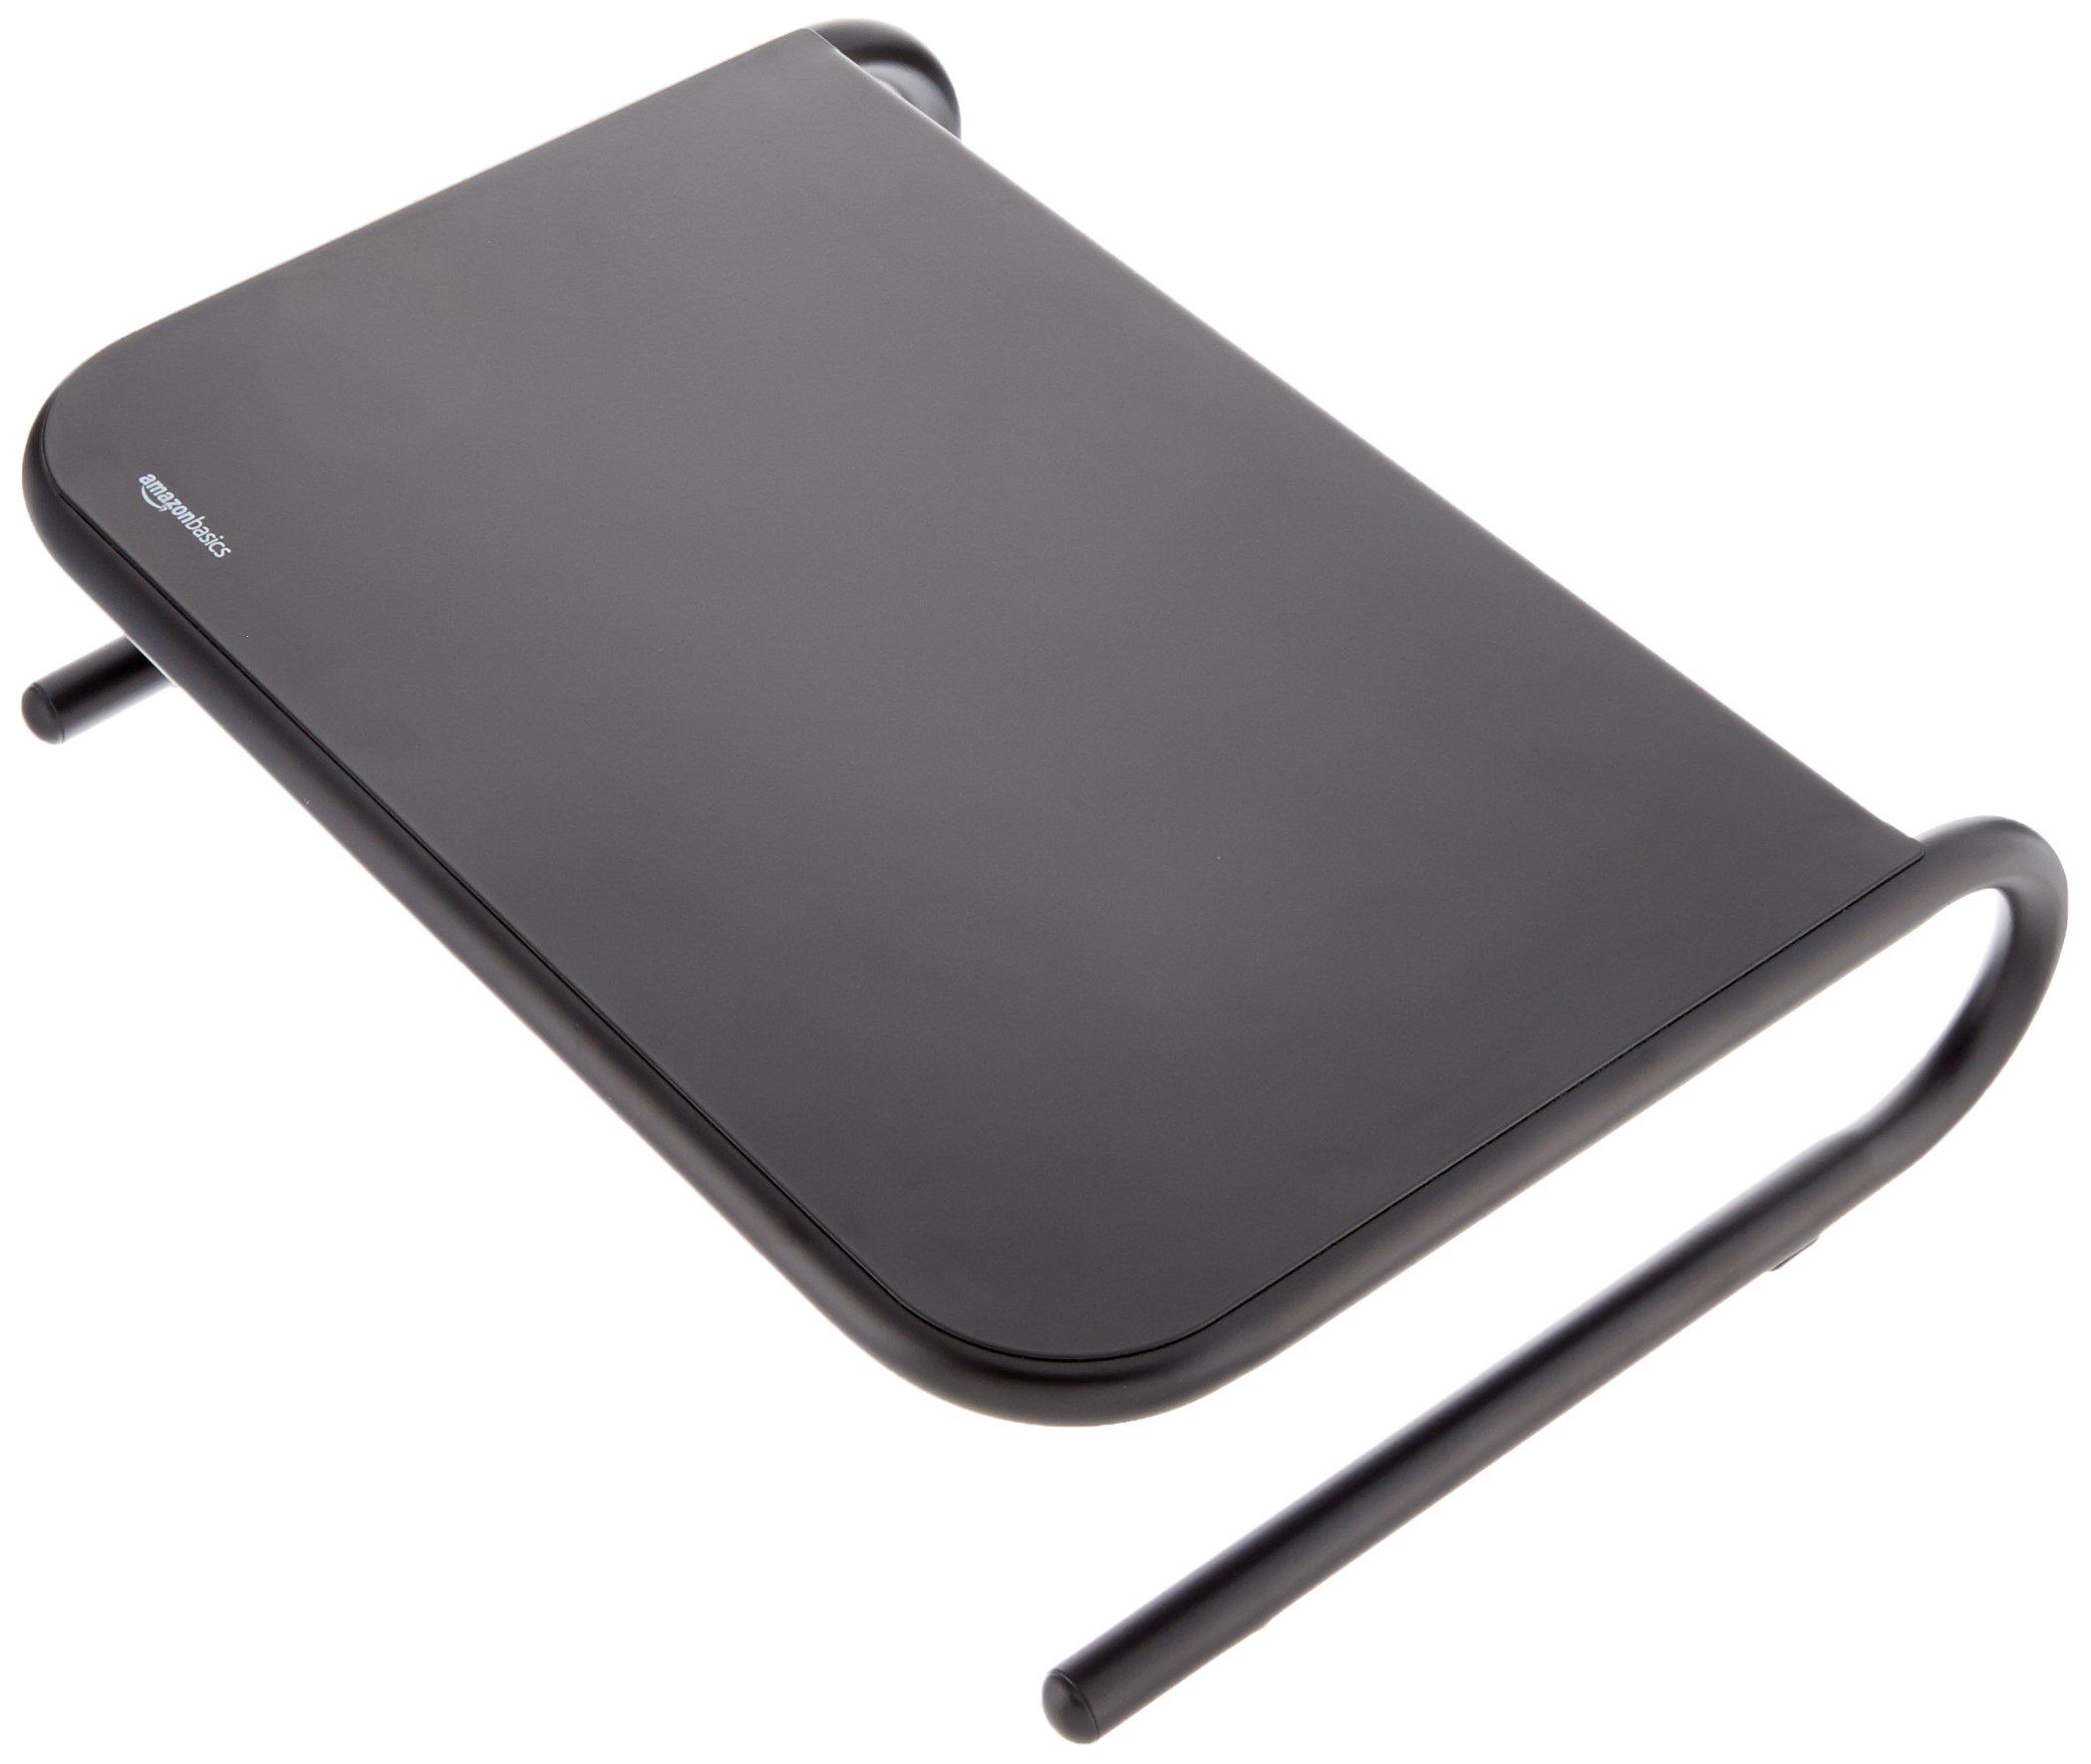 AmazonBasics Metal Laptop Computer Monitor Riser Stand - Black by AmazonBasics